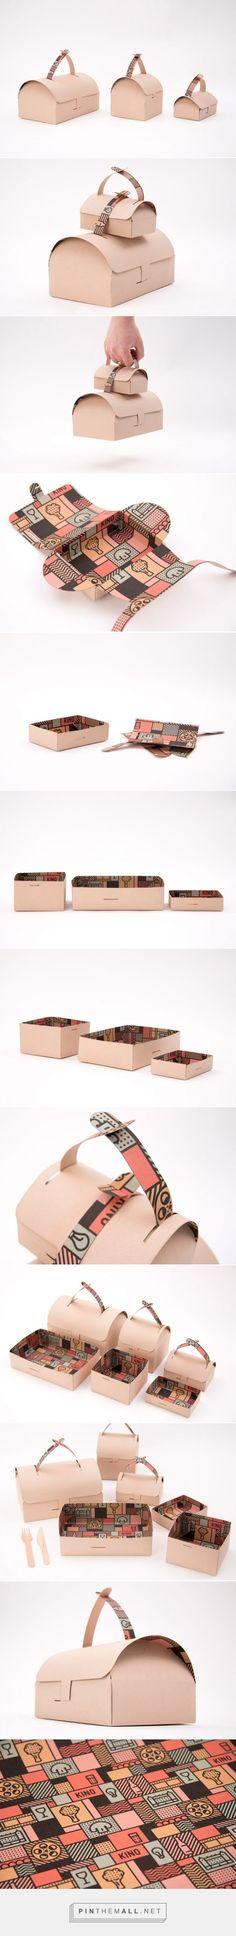 Kino Take Away #concept #packaging designed by Gustav Karlsson